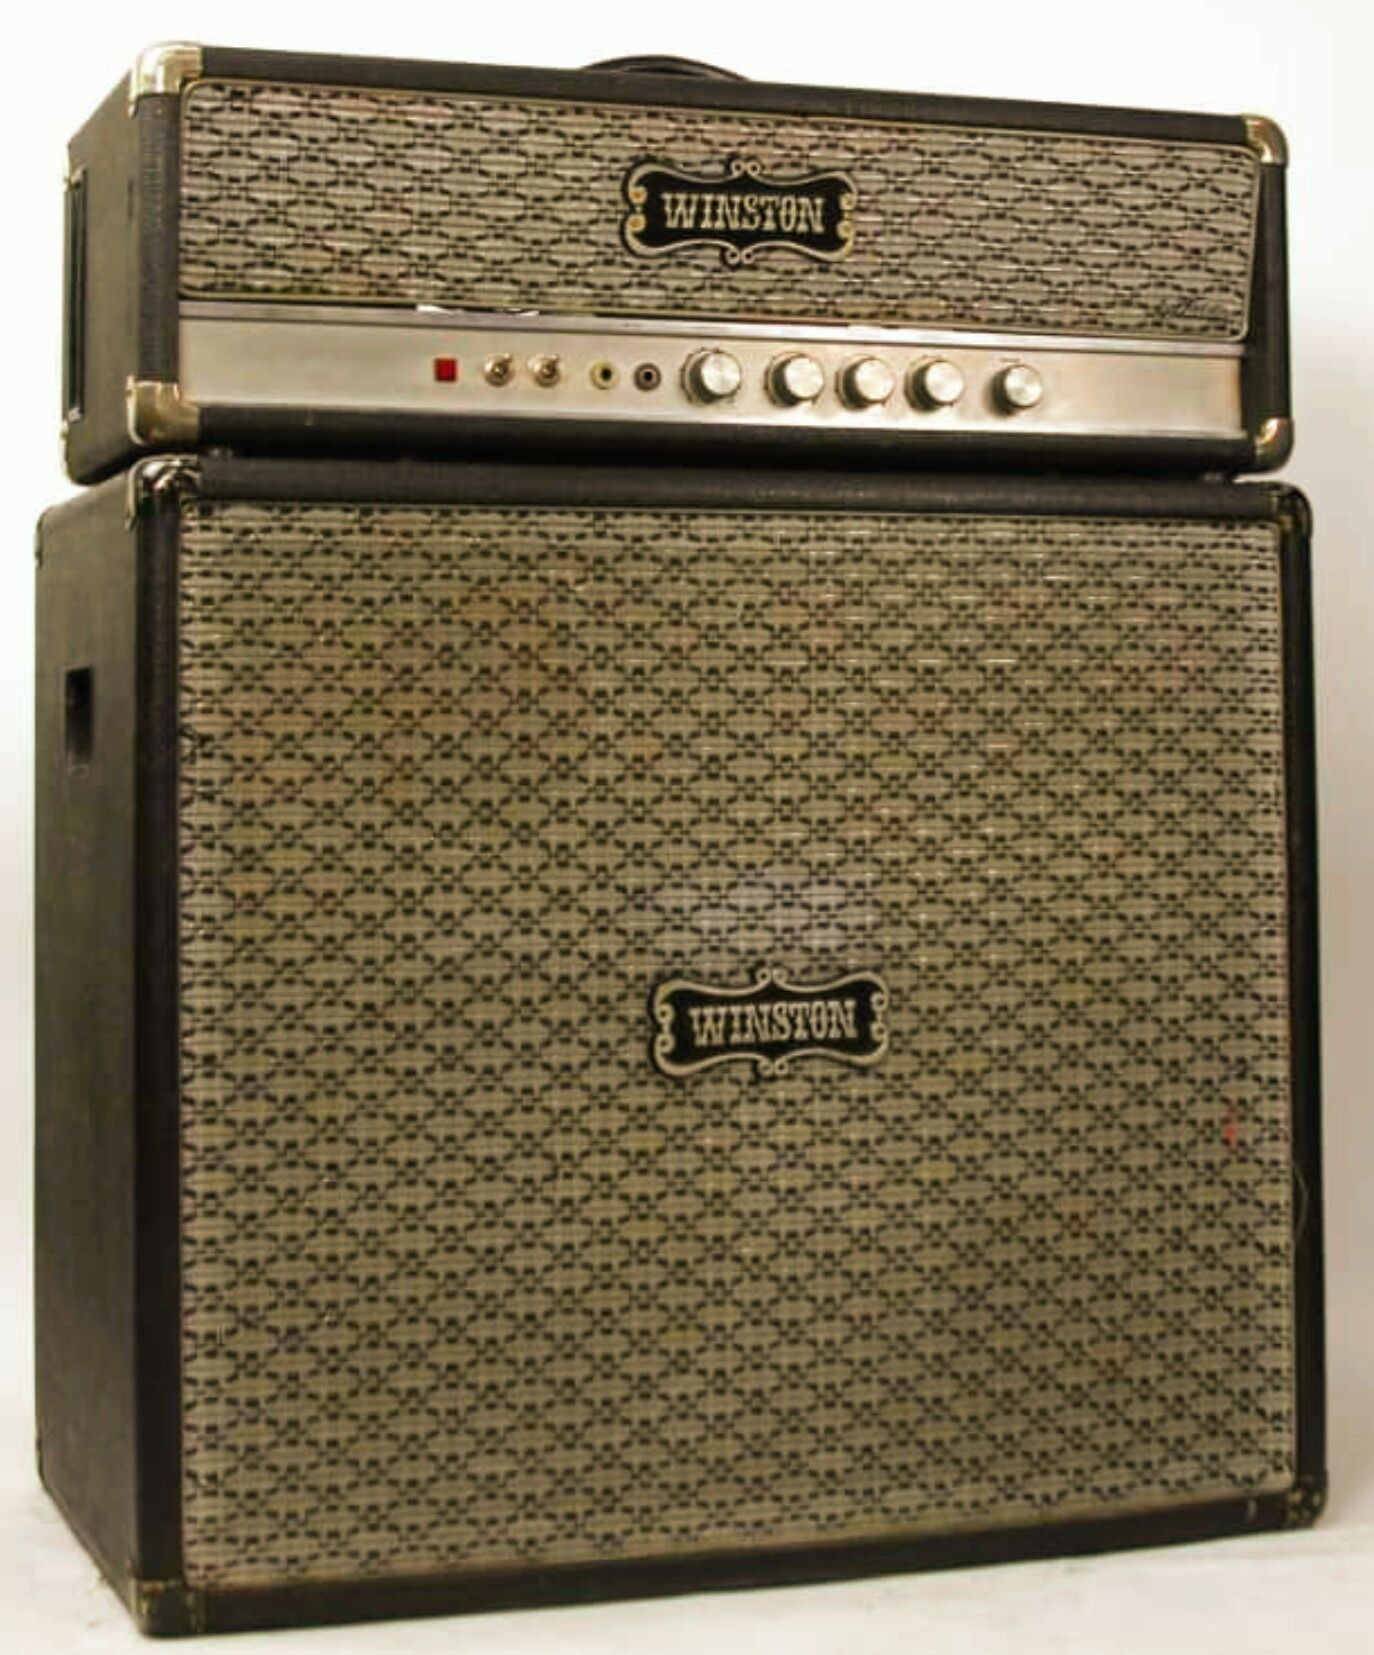 1970 winston ba 200 made by echolette de germanium ss pre amp w four el34 two 85 watt 12inch fane speakers great early hiwatt sound save schematic  [ 1374 x 1655 Pixel ]